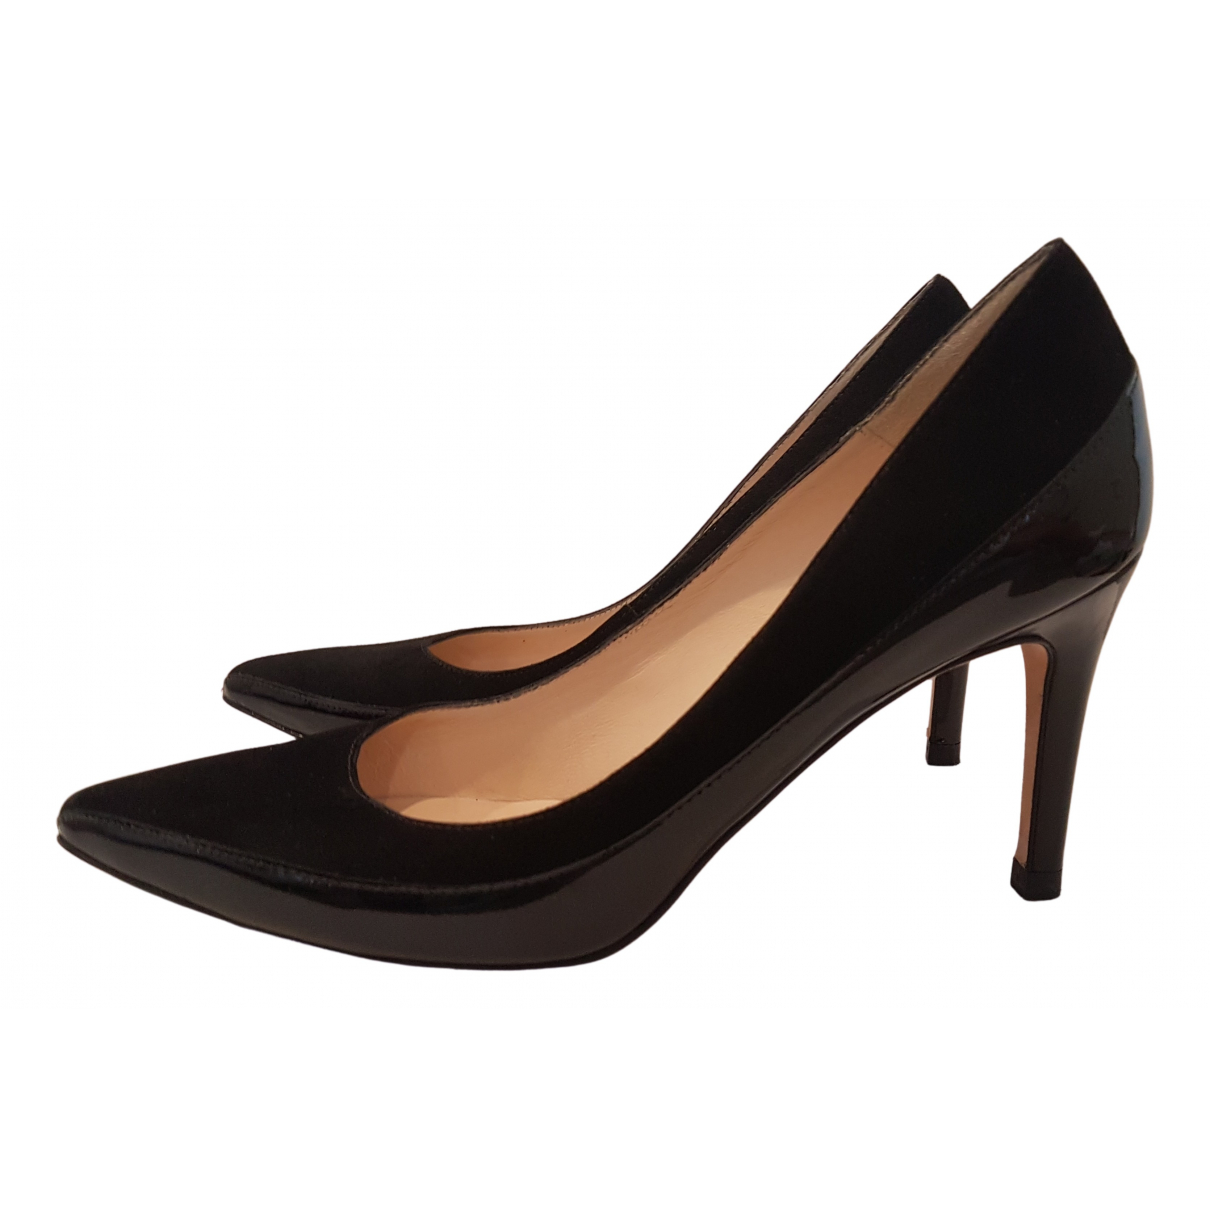 Lk Bennett N Black Patent leather Heels for Women 37 EU